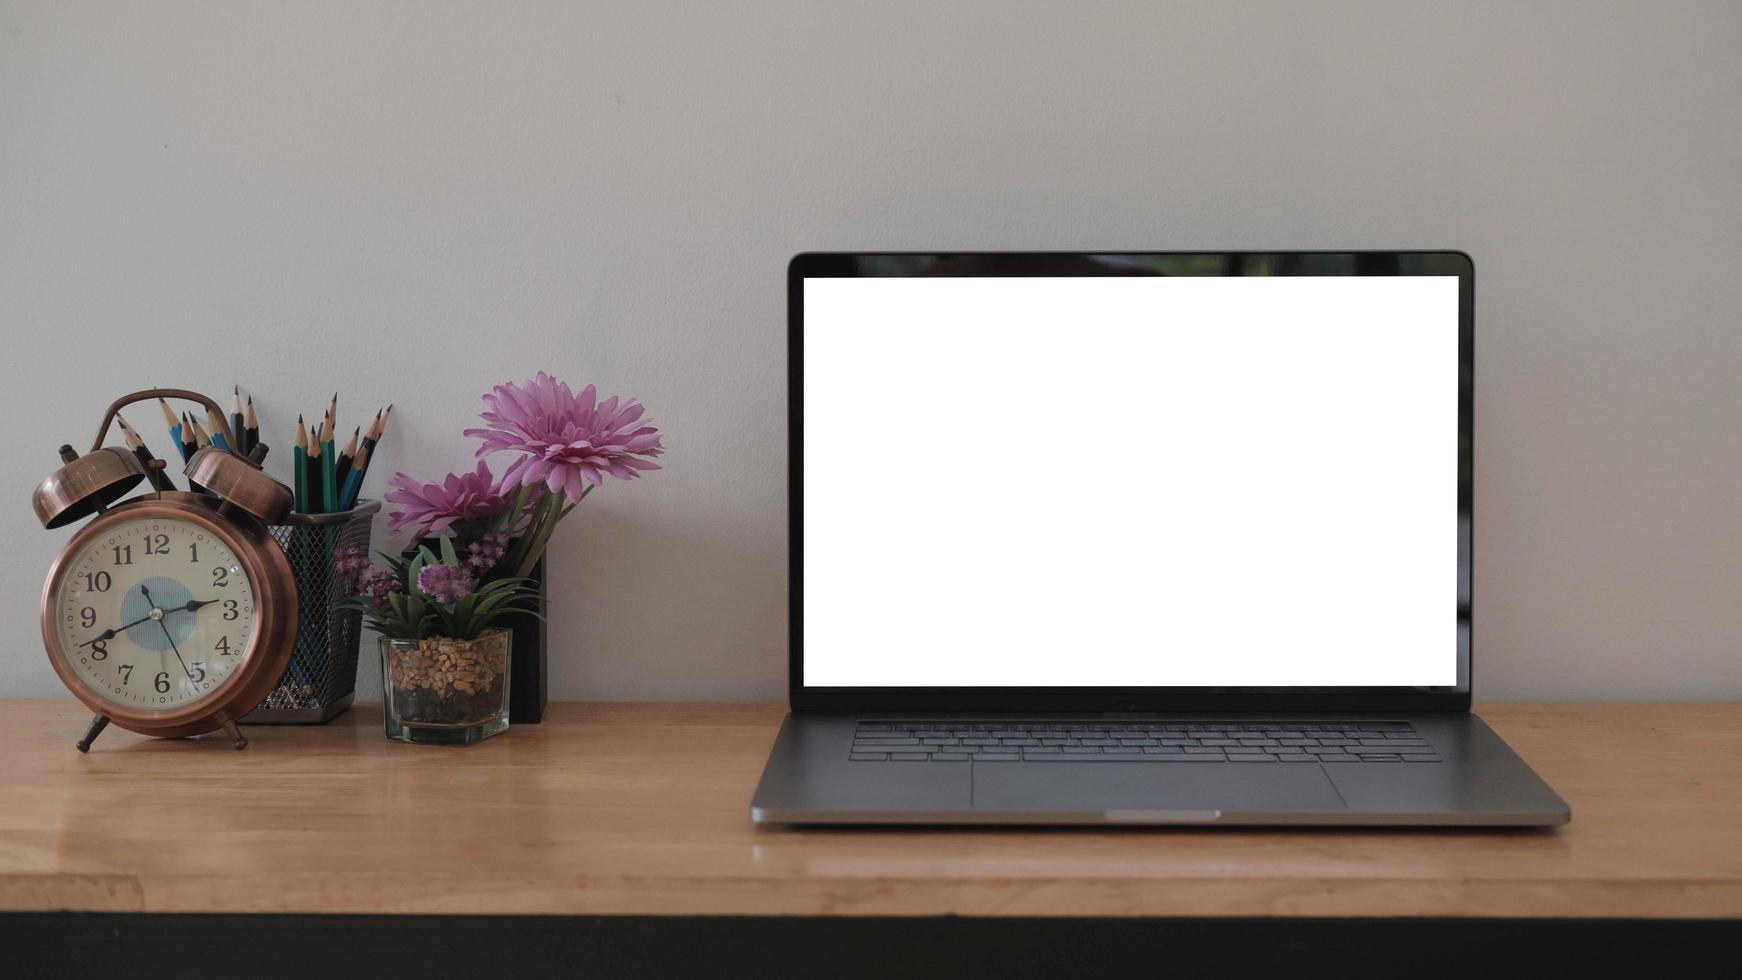 ordinateur portable au bureau photo